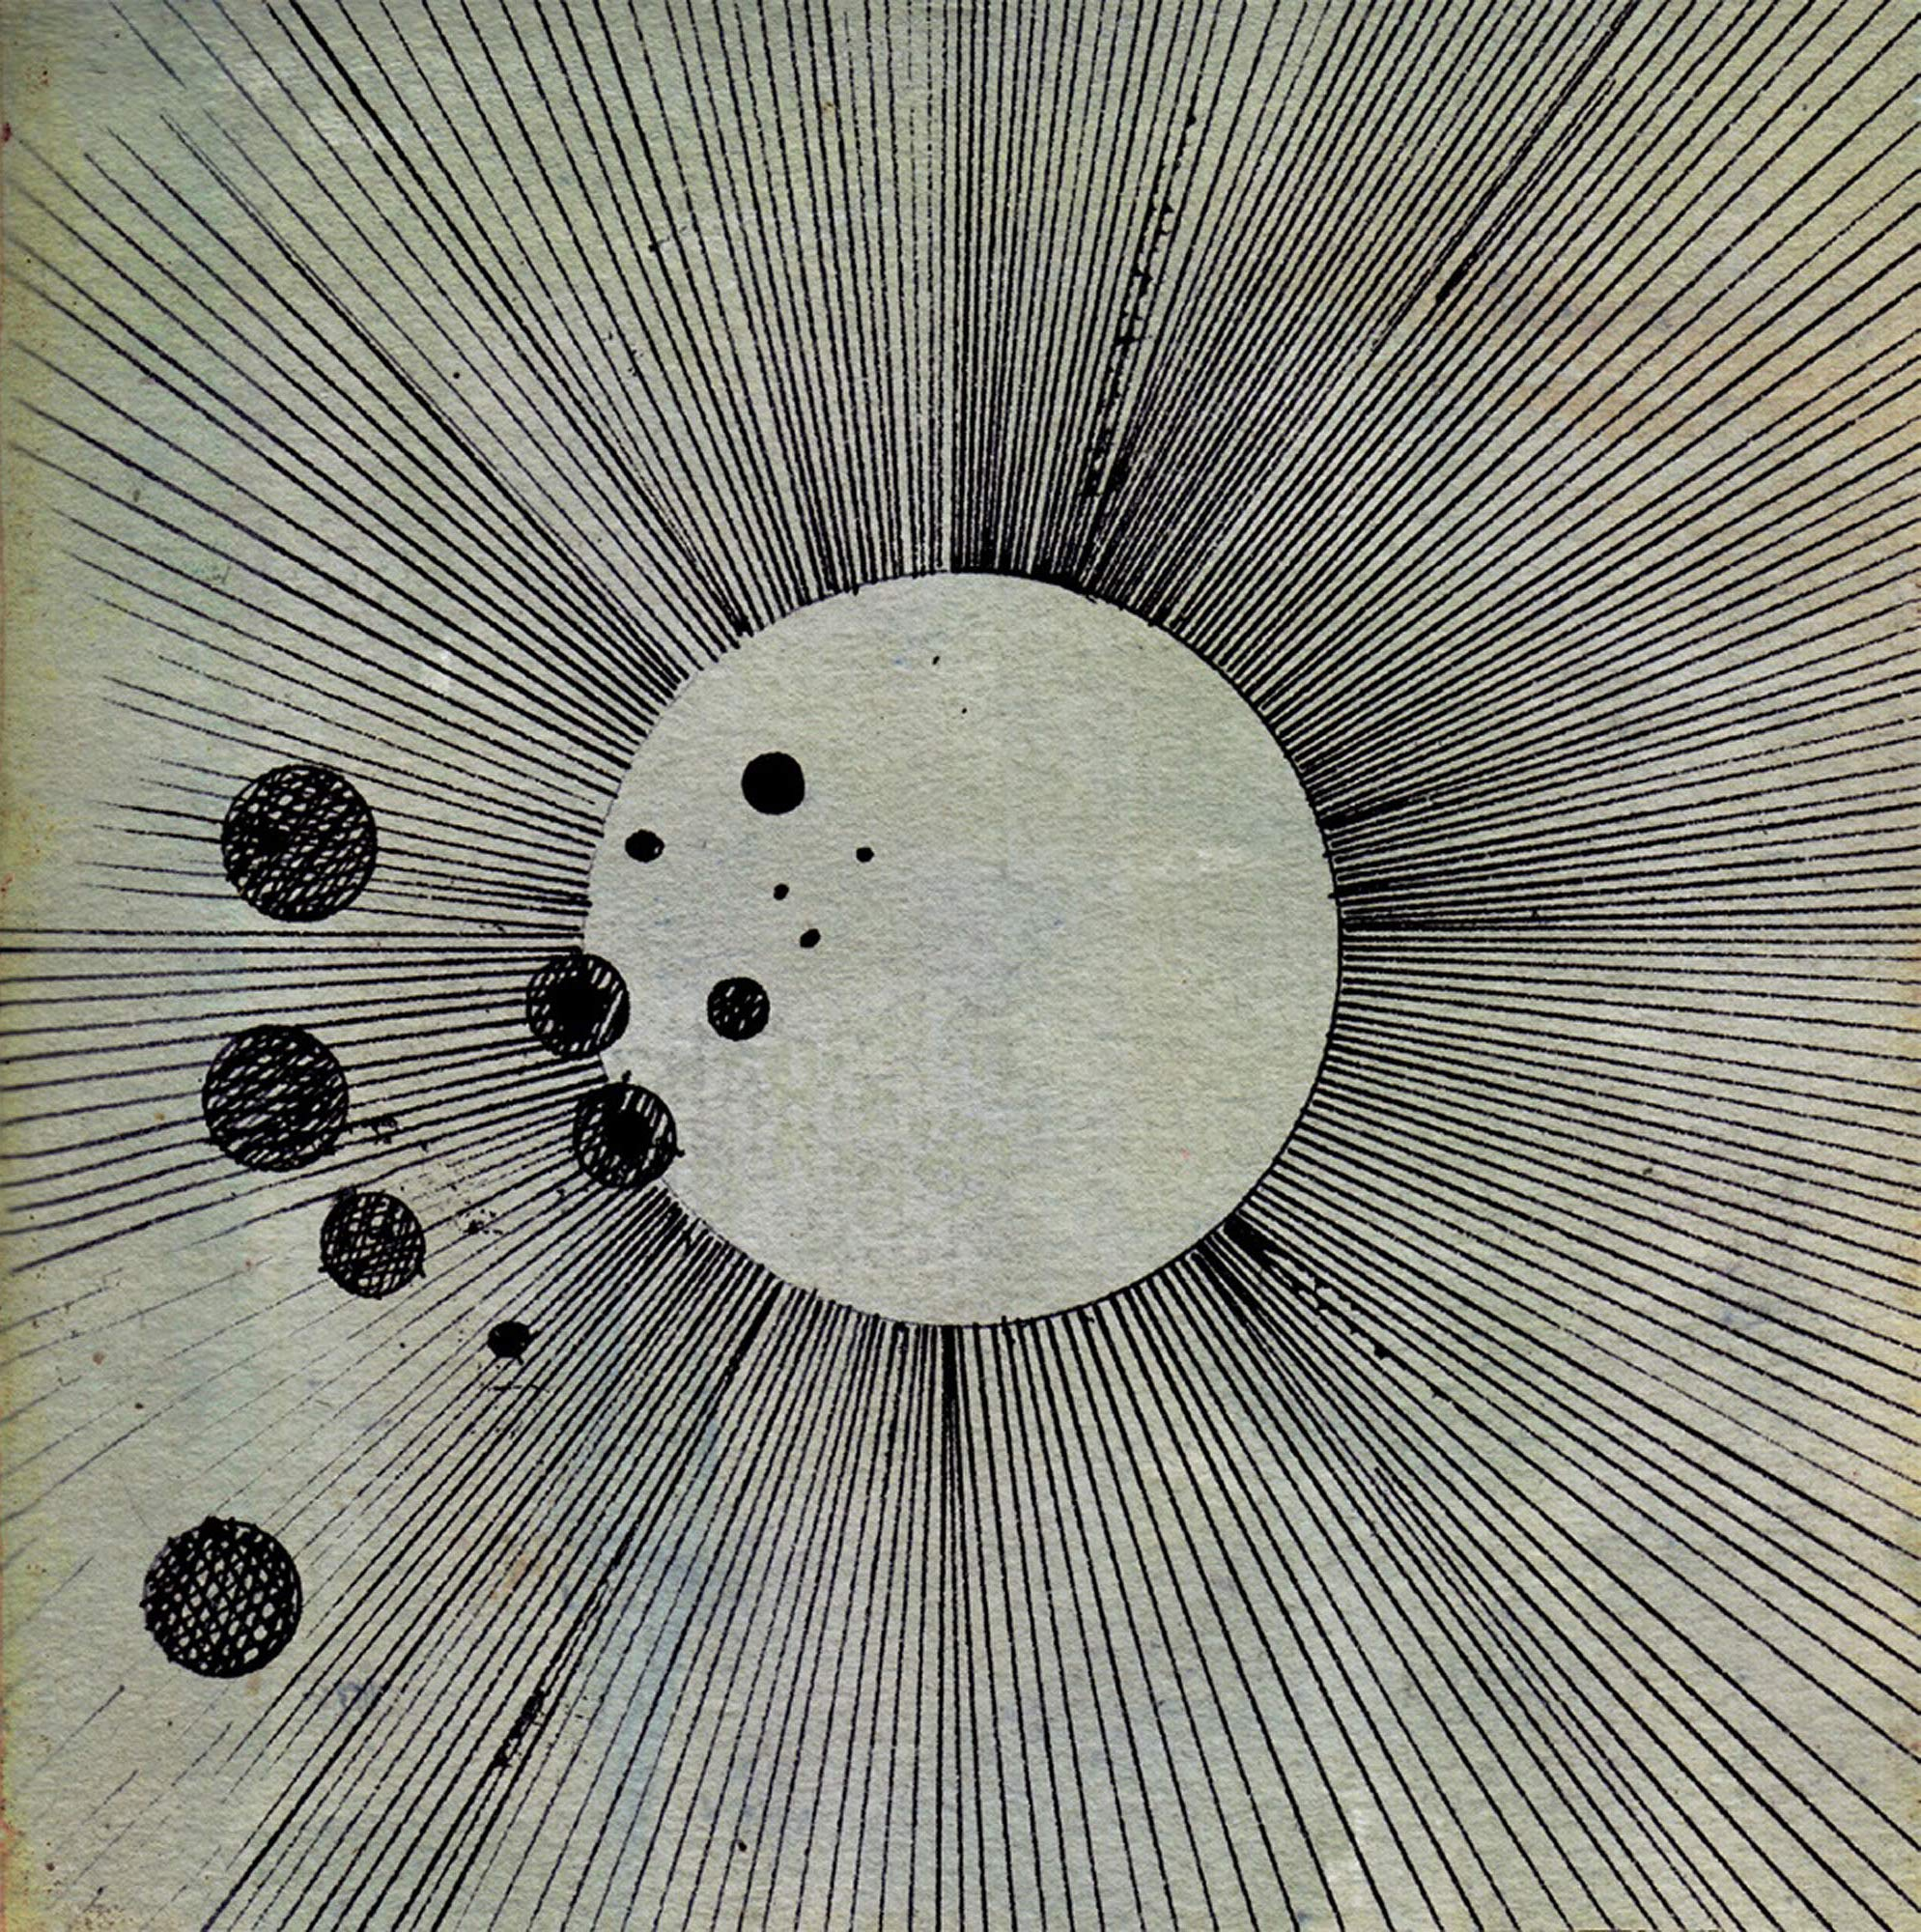 Cosmogramma [Vinyl] by VINYL